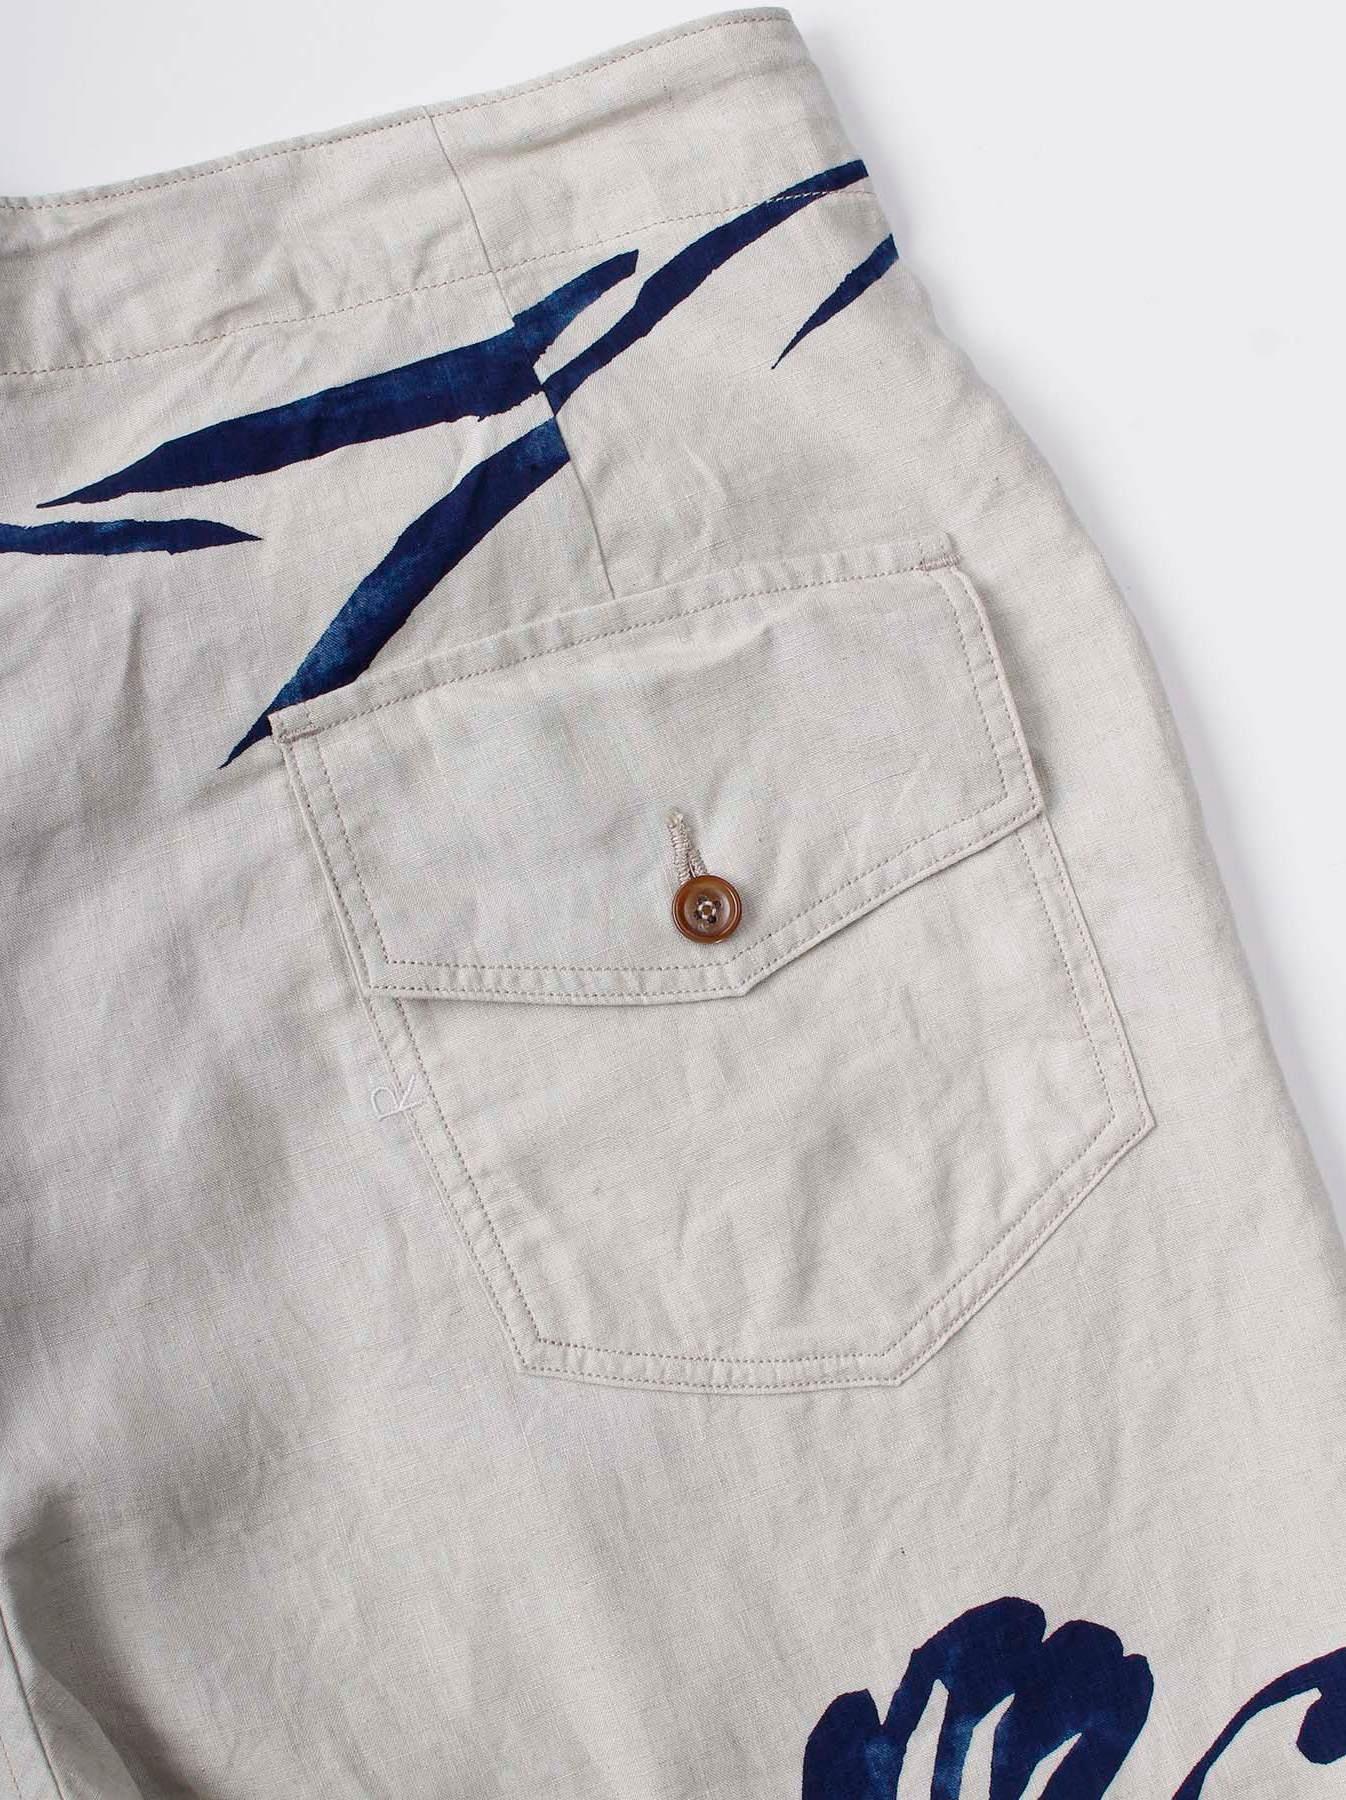 WH Indigo Linen Umiiloha 908 Short Pants-12